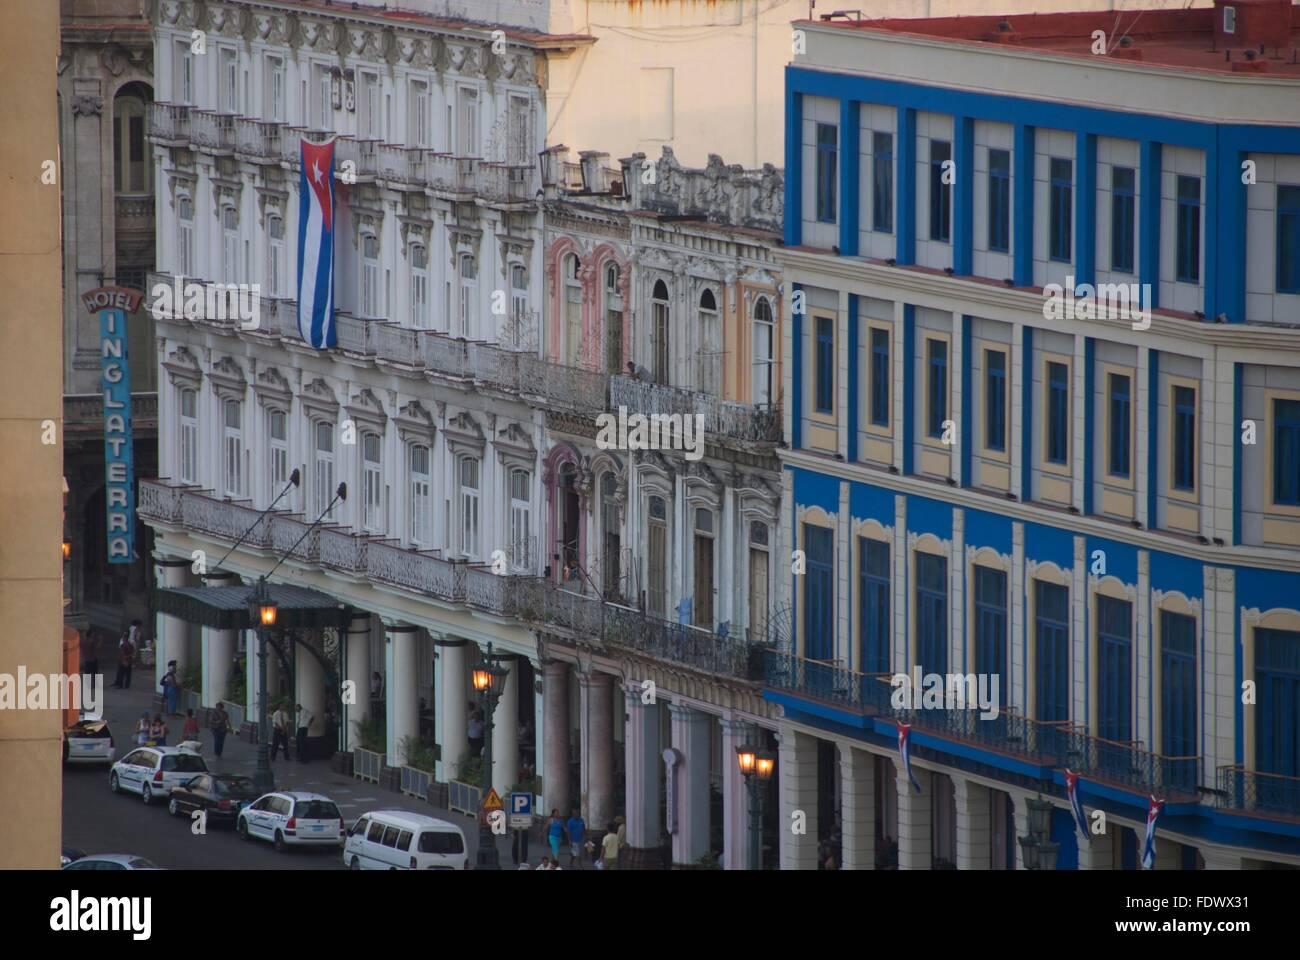 The Inglaterra hotel in Havana, Cuba - Stock Image